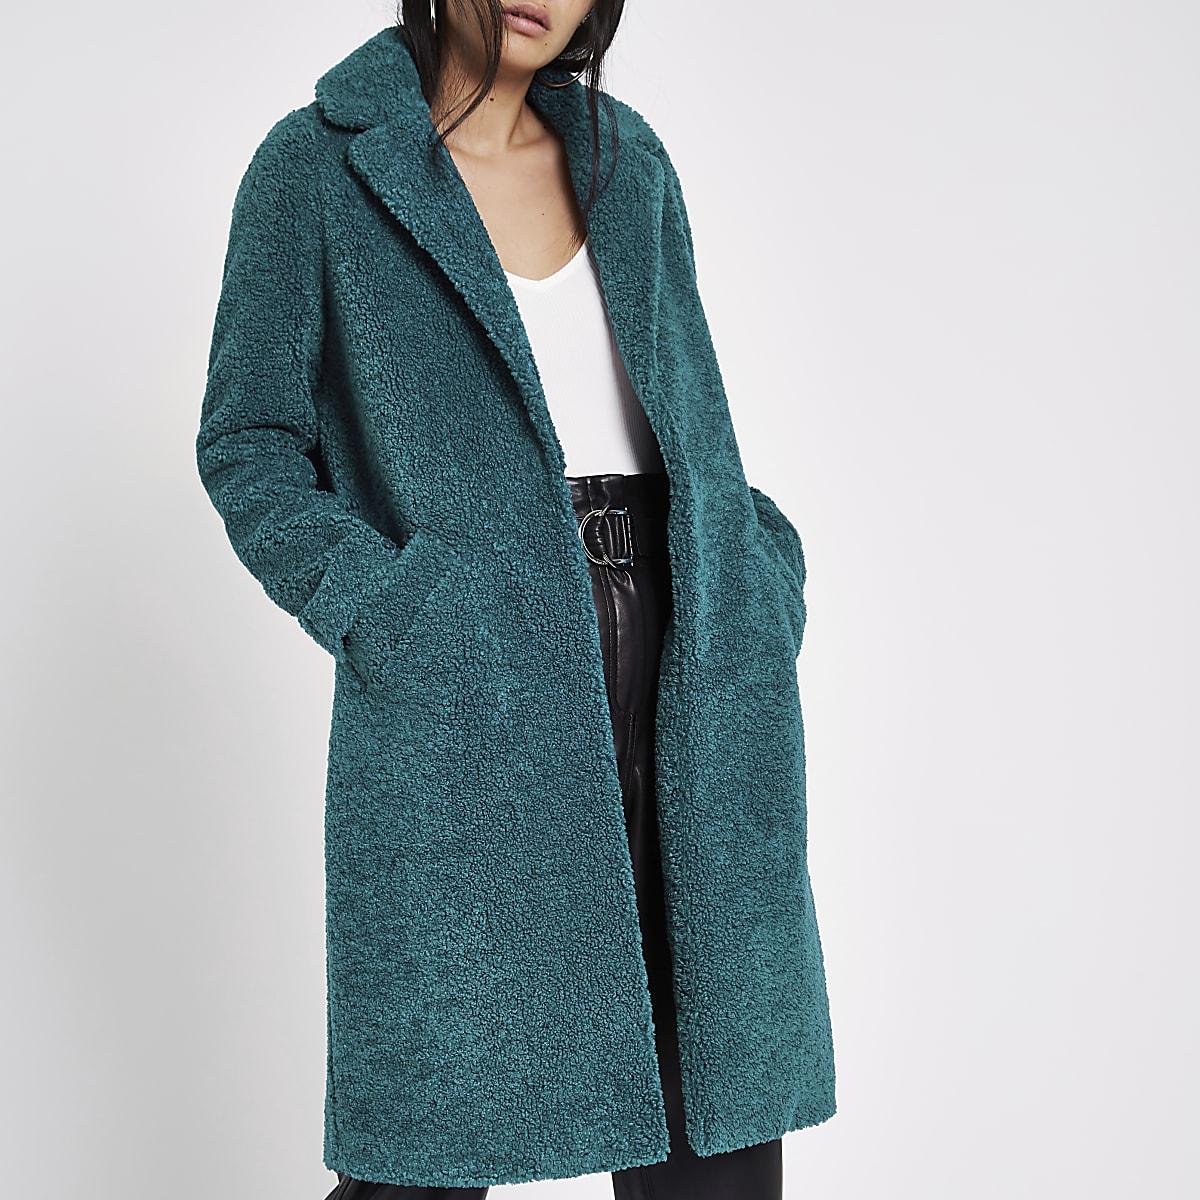 Teal green borg coat